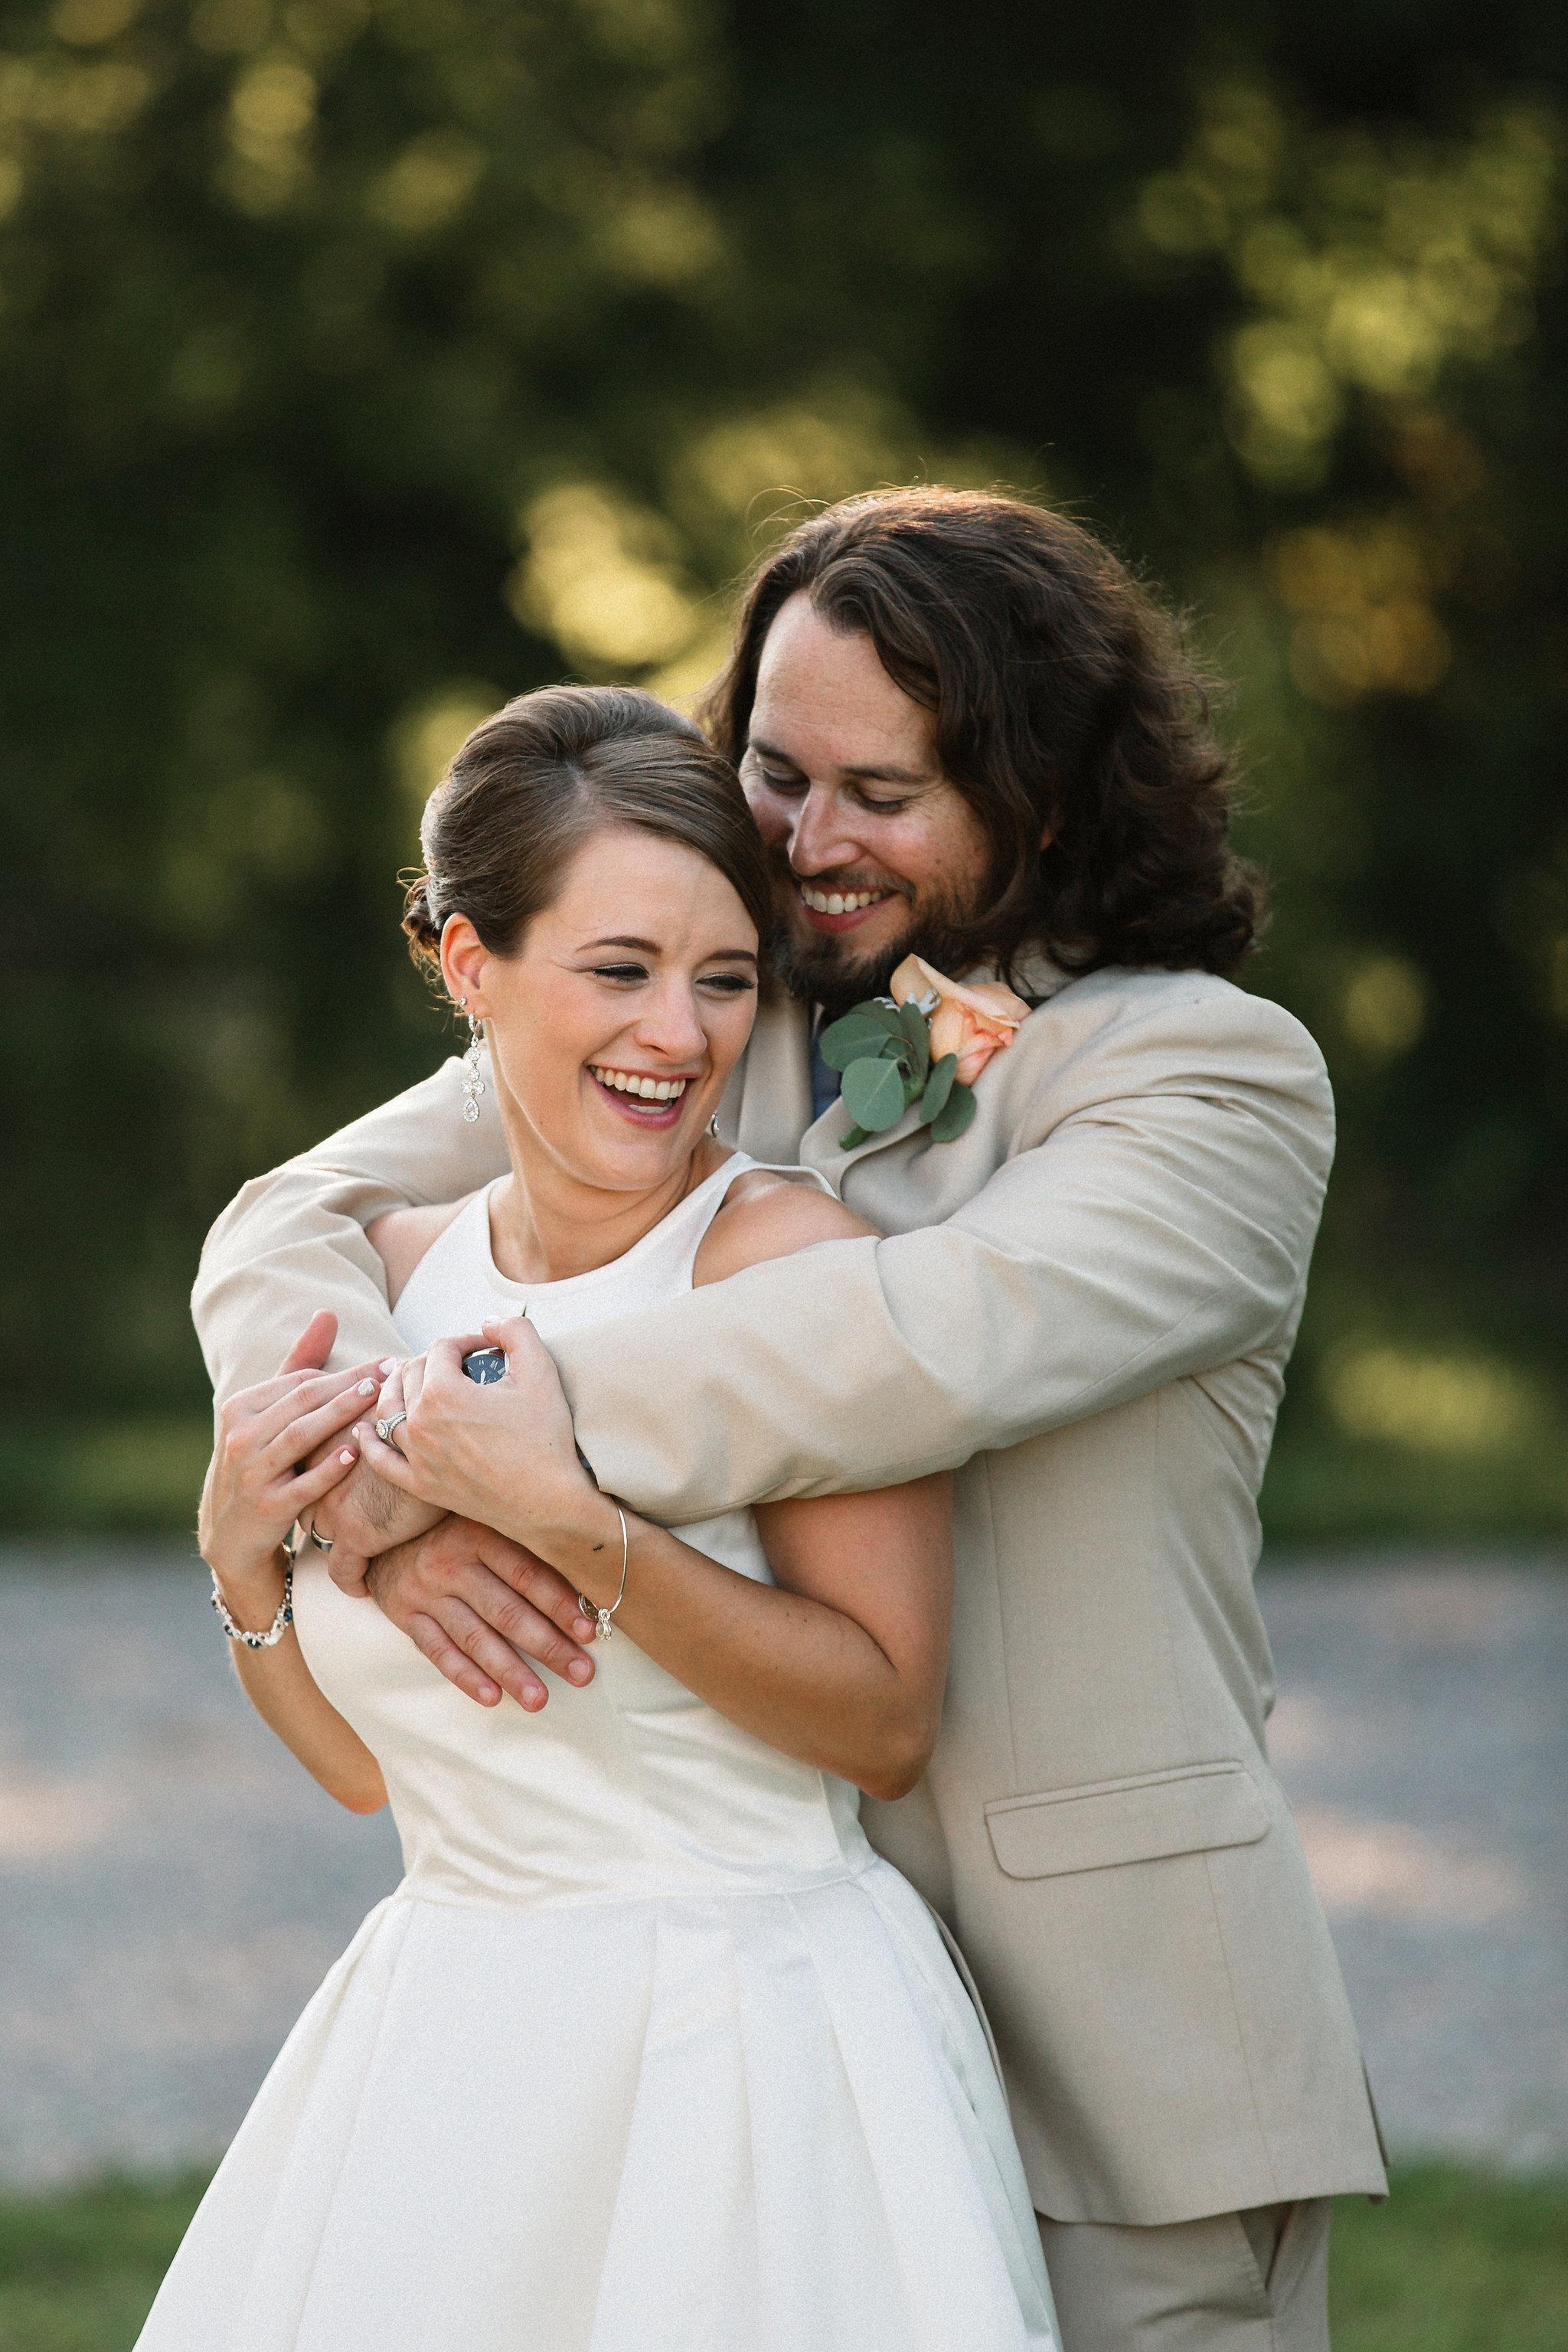 Lindsay&JoshMarried2017-08-31at19.08.15PM38.jpg